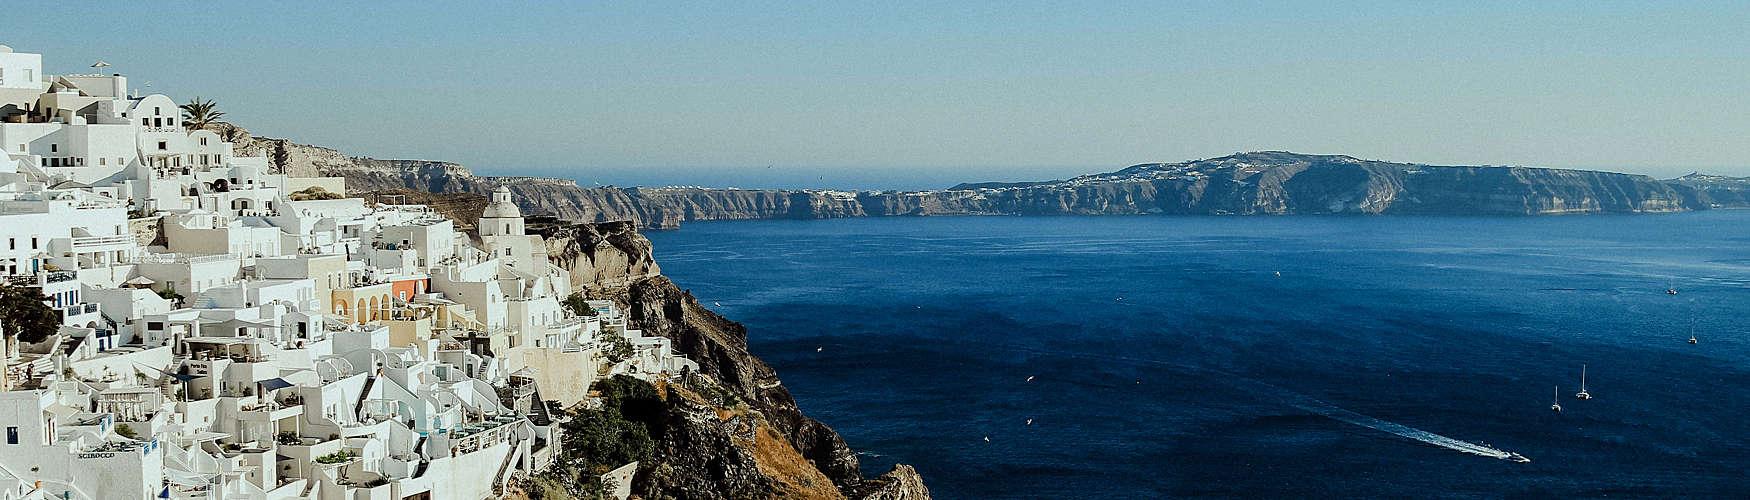 Cover image for Santorini